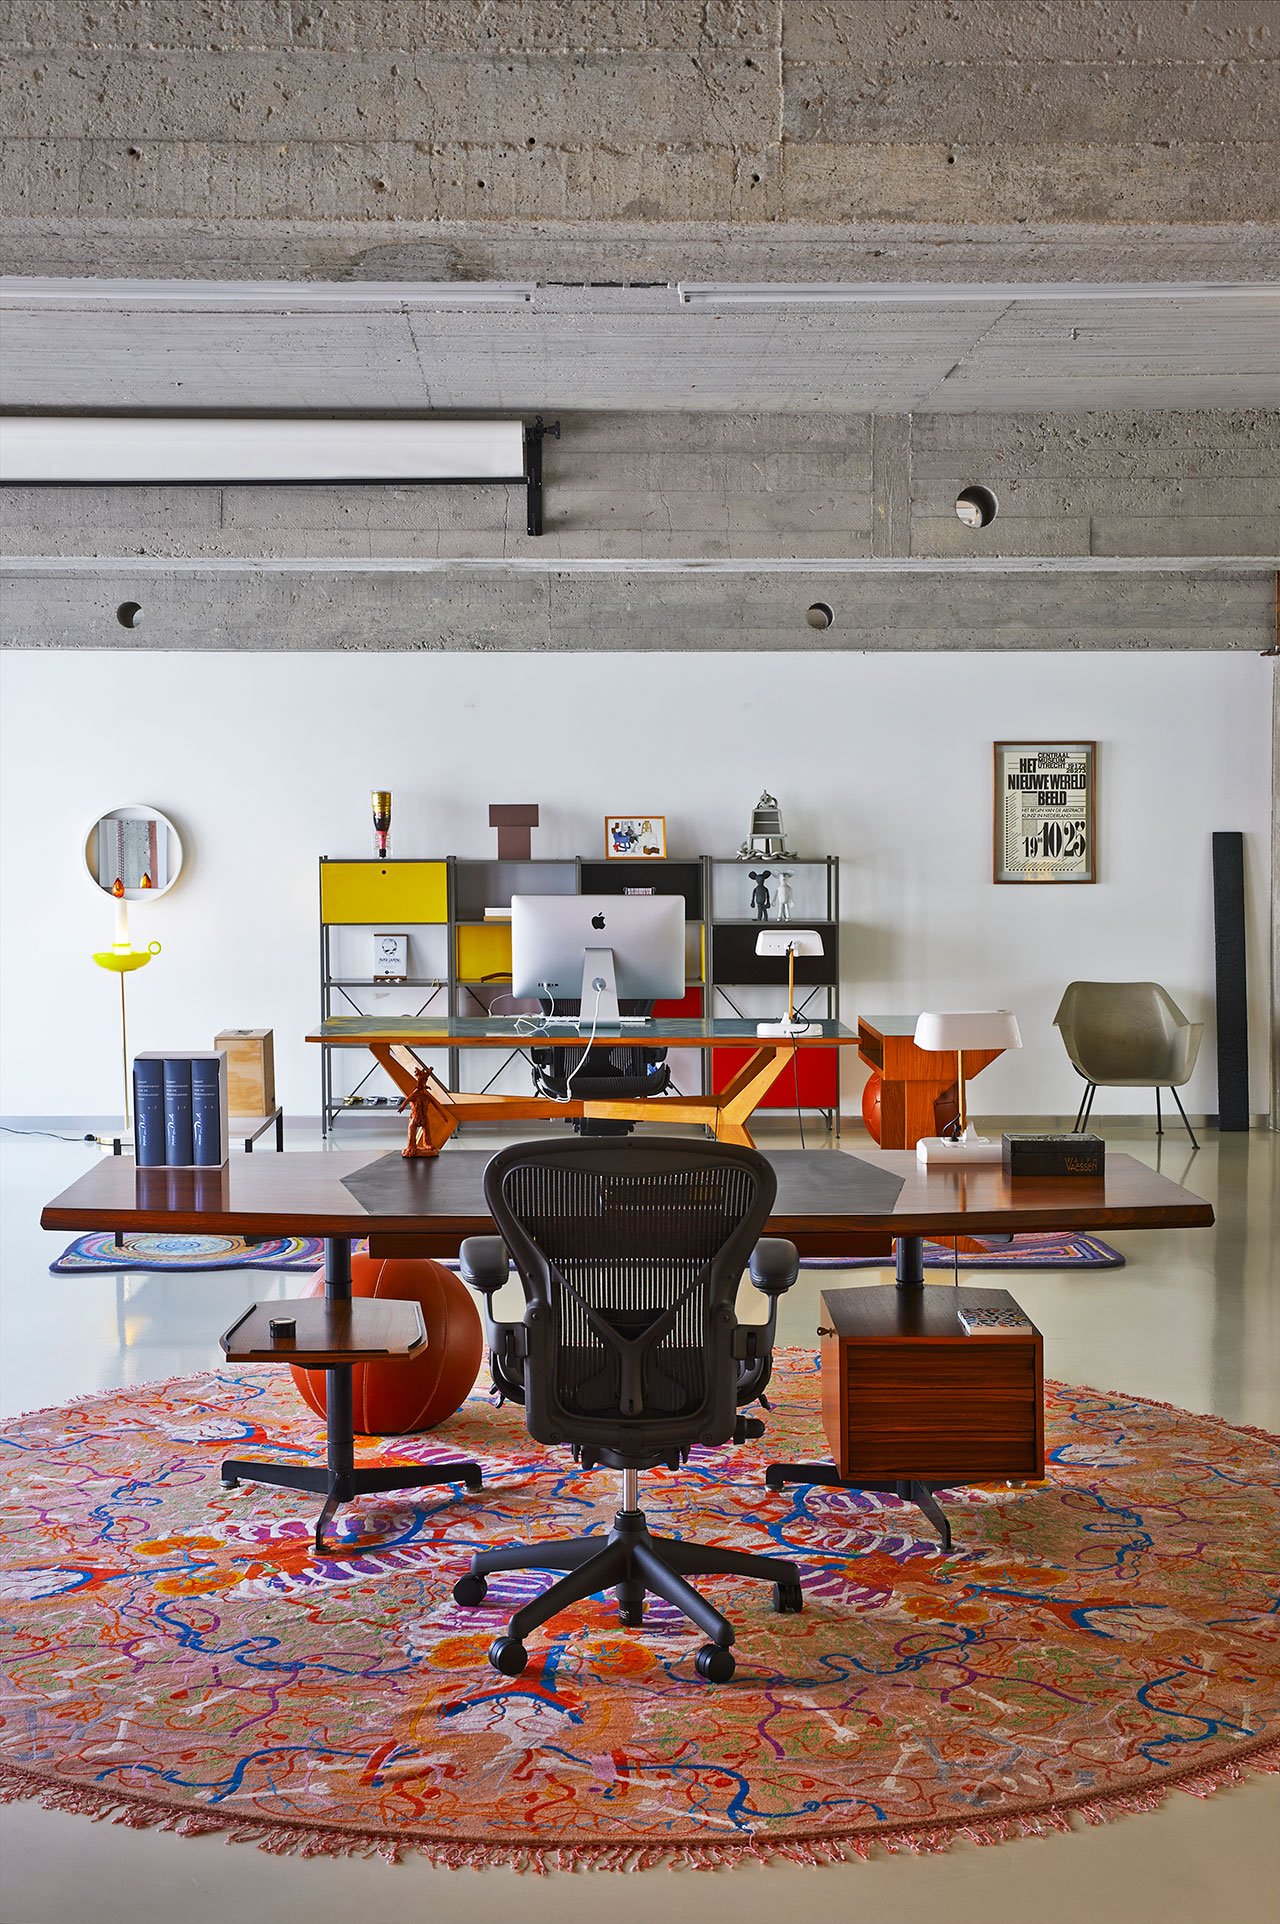 Studio.Chair: Aeron, Herman Miller. Desk: T96, Techno, Osvaldo Borsani, 1955.Carpet: Quack, Nodus, Studio Job, 2011.Desk lamp: Work, Tichelaar Makkum, the Dick Hoff, 2007.Pouf: Playtime, Montis, Studio Job, 2005.Mirror: DZ84, 't Spectrum, Benno, 1956.Lamp Candle Stick, Mae West, Venini, Studio Job, 2011. Cabinet: 663 Gispen, Wim Rietveld, 1954.Mice: Johan Peter Hol, 2003. Vase: mat, Cor Unum, Benno, 1993.Champagne Piper Heidsieck, Viktor & Rolf, 2007.Bucket seat: Gispen 416, Wim Rietveld & Andre Cordemeyer, 1955. Oak plank: smoke, Maarten Baas, 2007. Poster: Centraal Museum, Anthon Beeke, 1984.Photo by Dennis Brandsma.